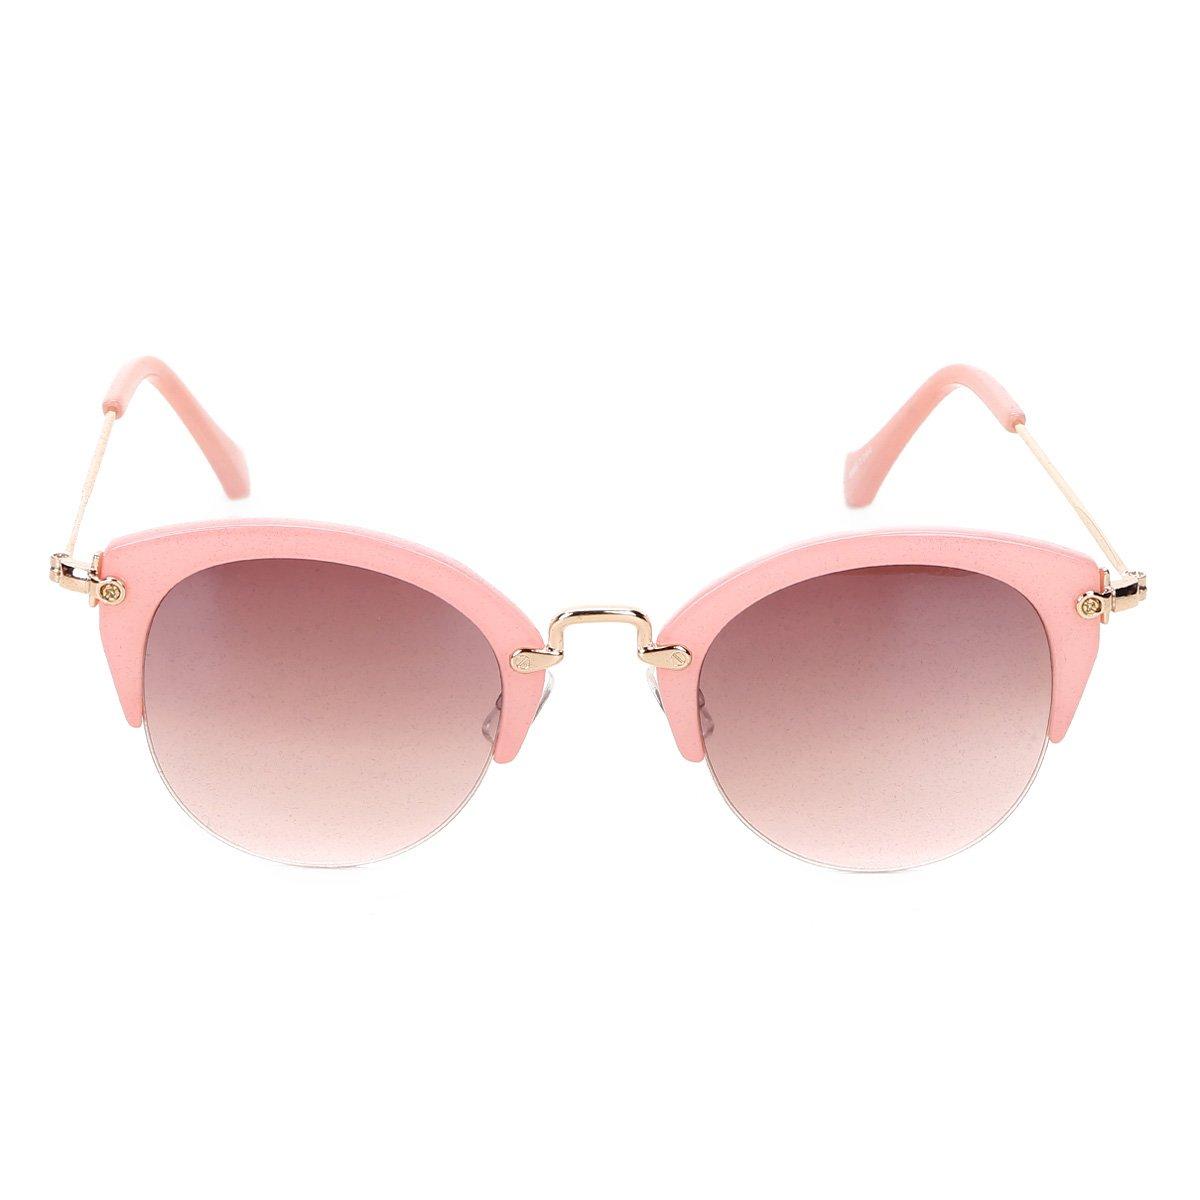 61ef7803c8f75 Óculos De Sol King One Redondo B88 1294 Feminino - Compre Agora ...